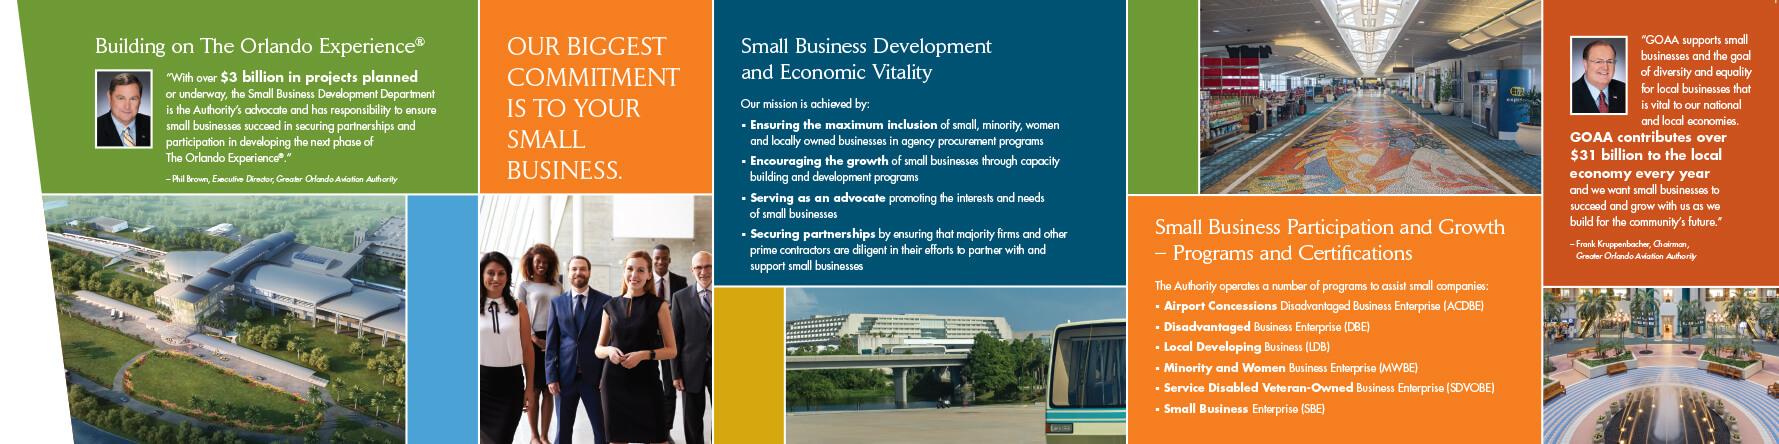 orlando international airport small business development